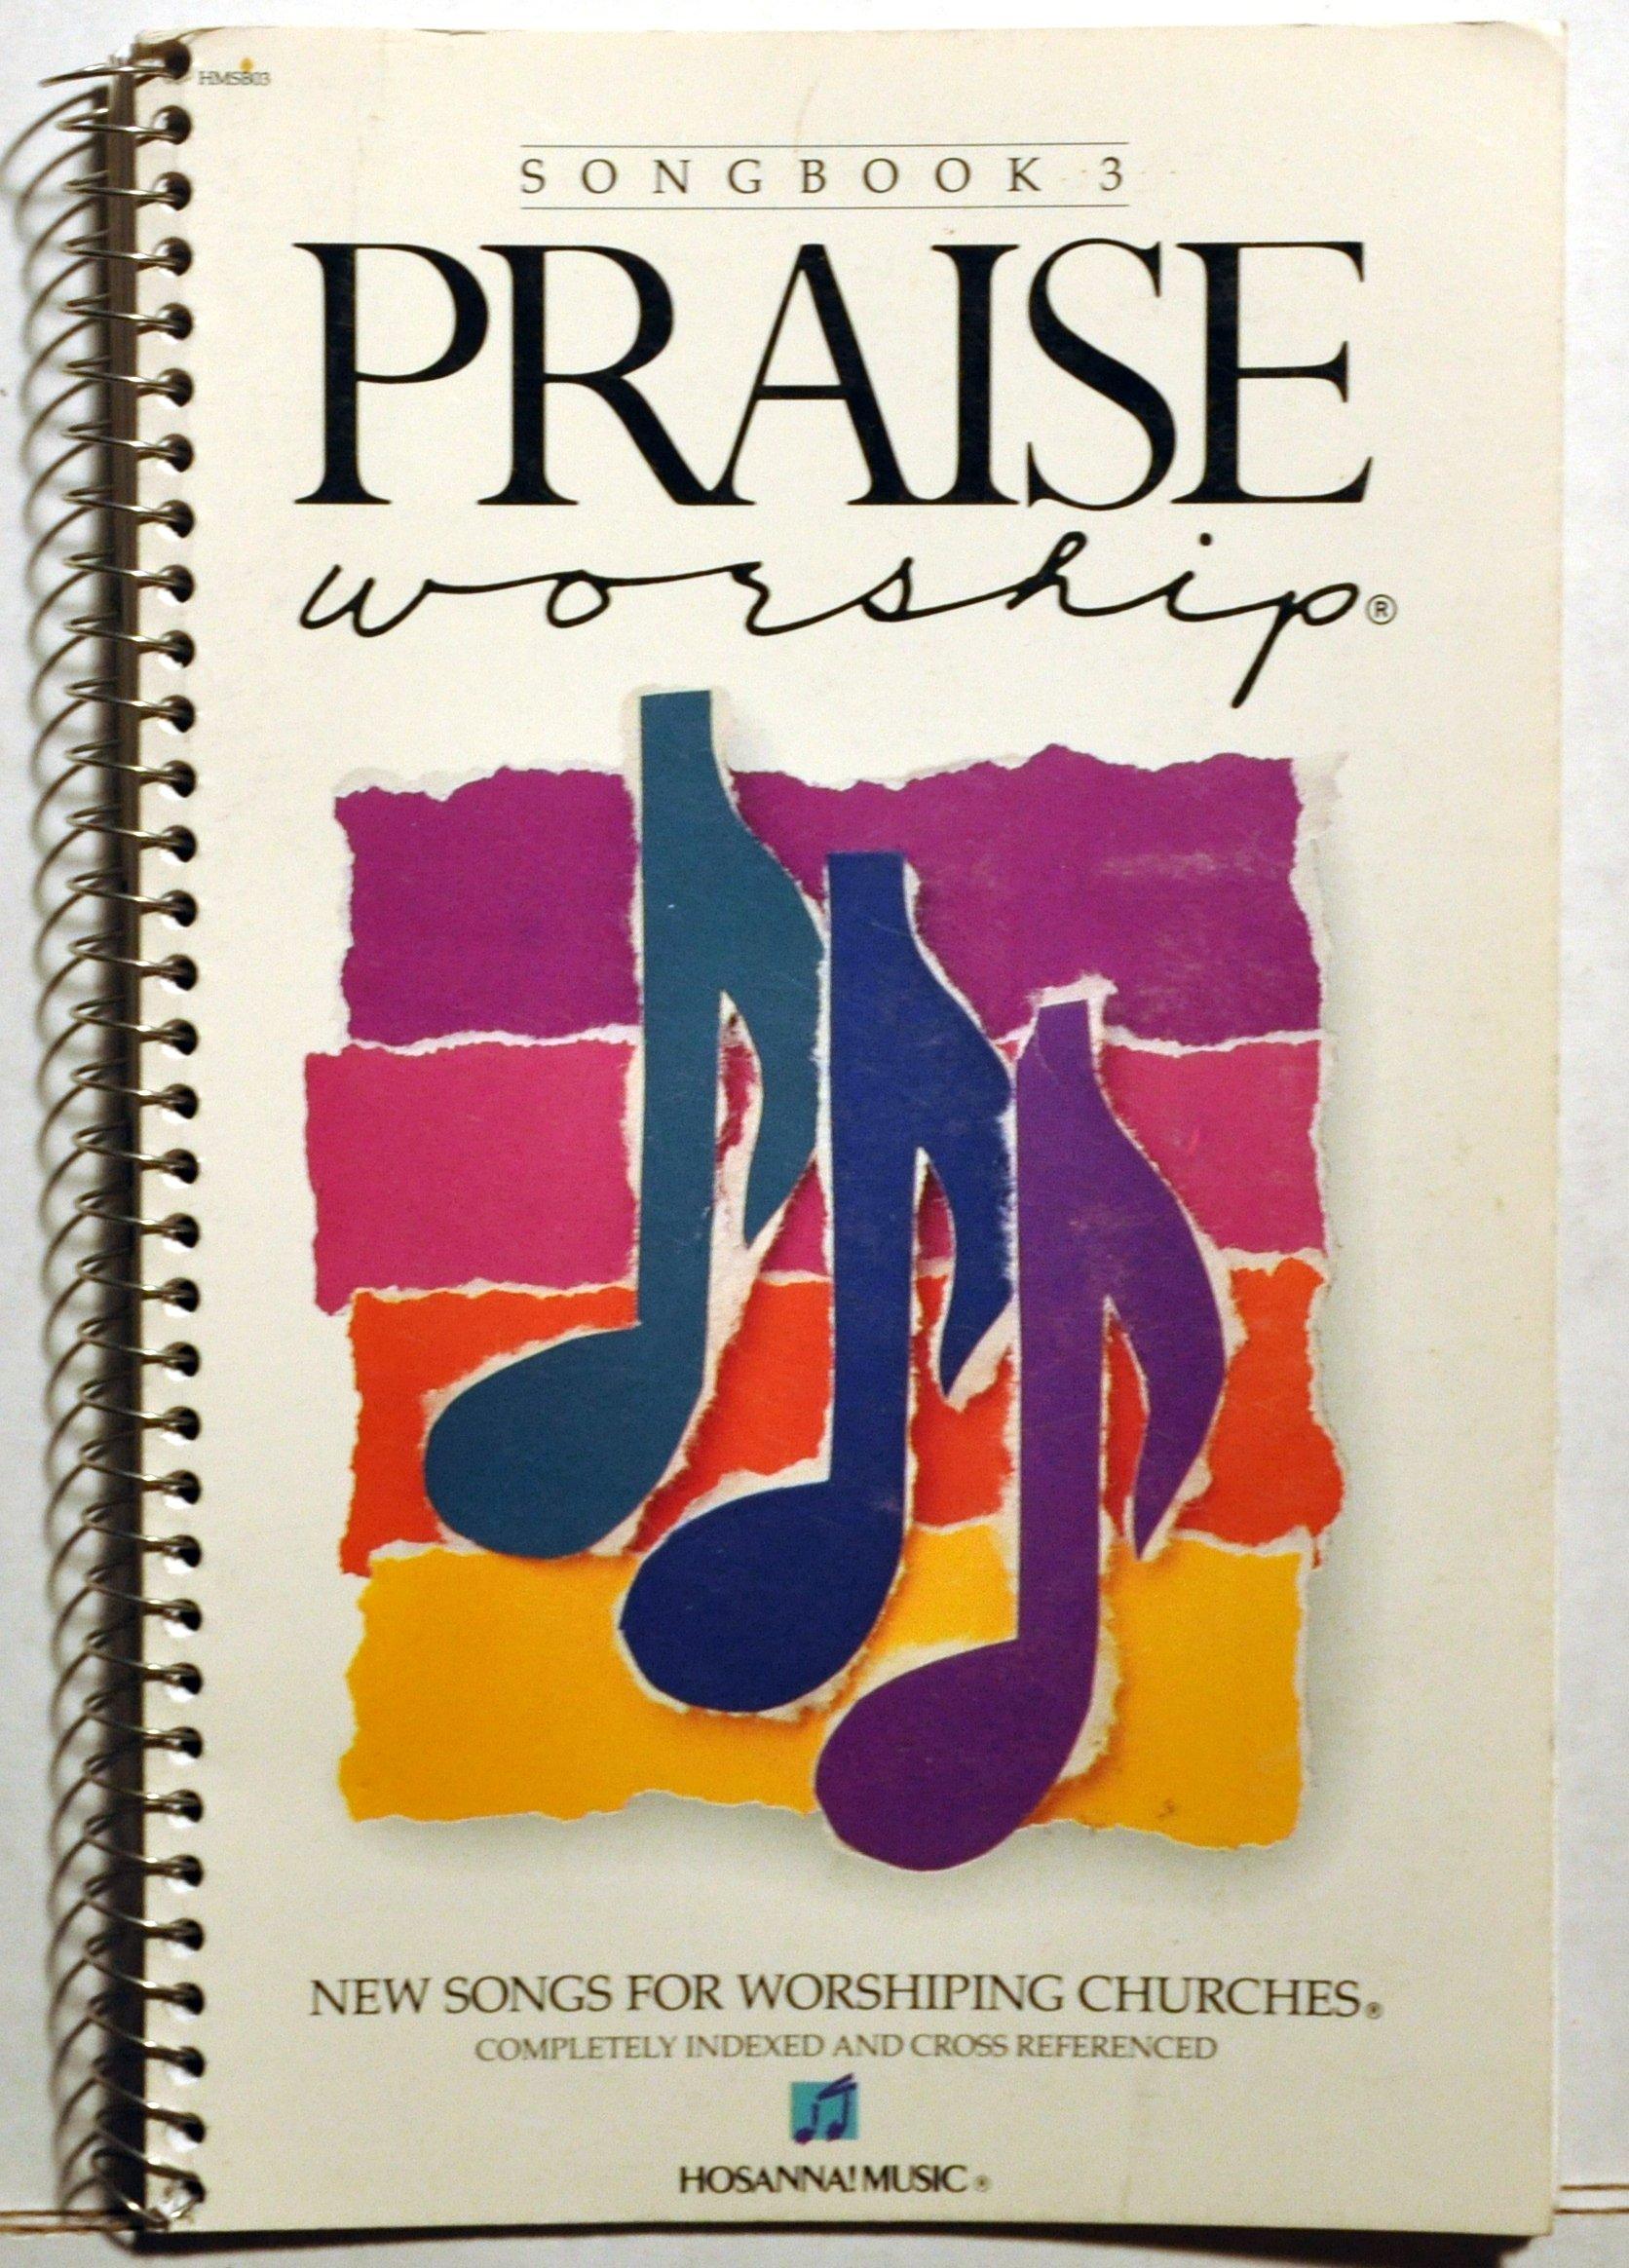 Hosanna Music Songbook 3 Praise Worship Don Moen Andrae Crouch